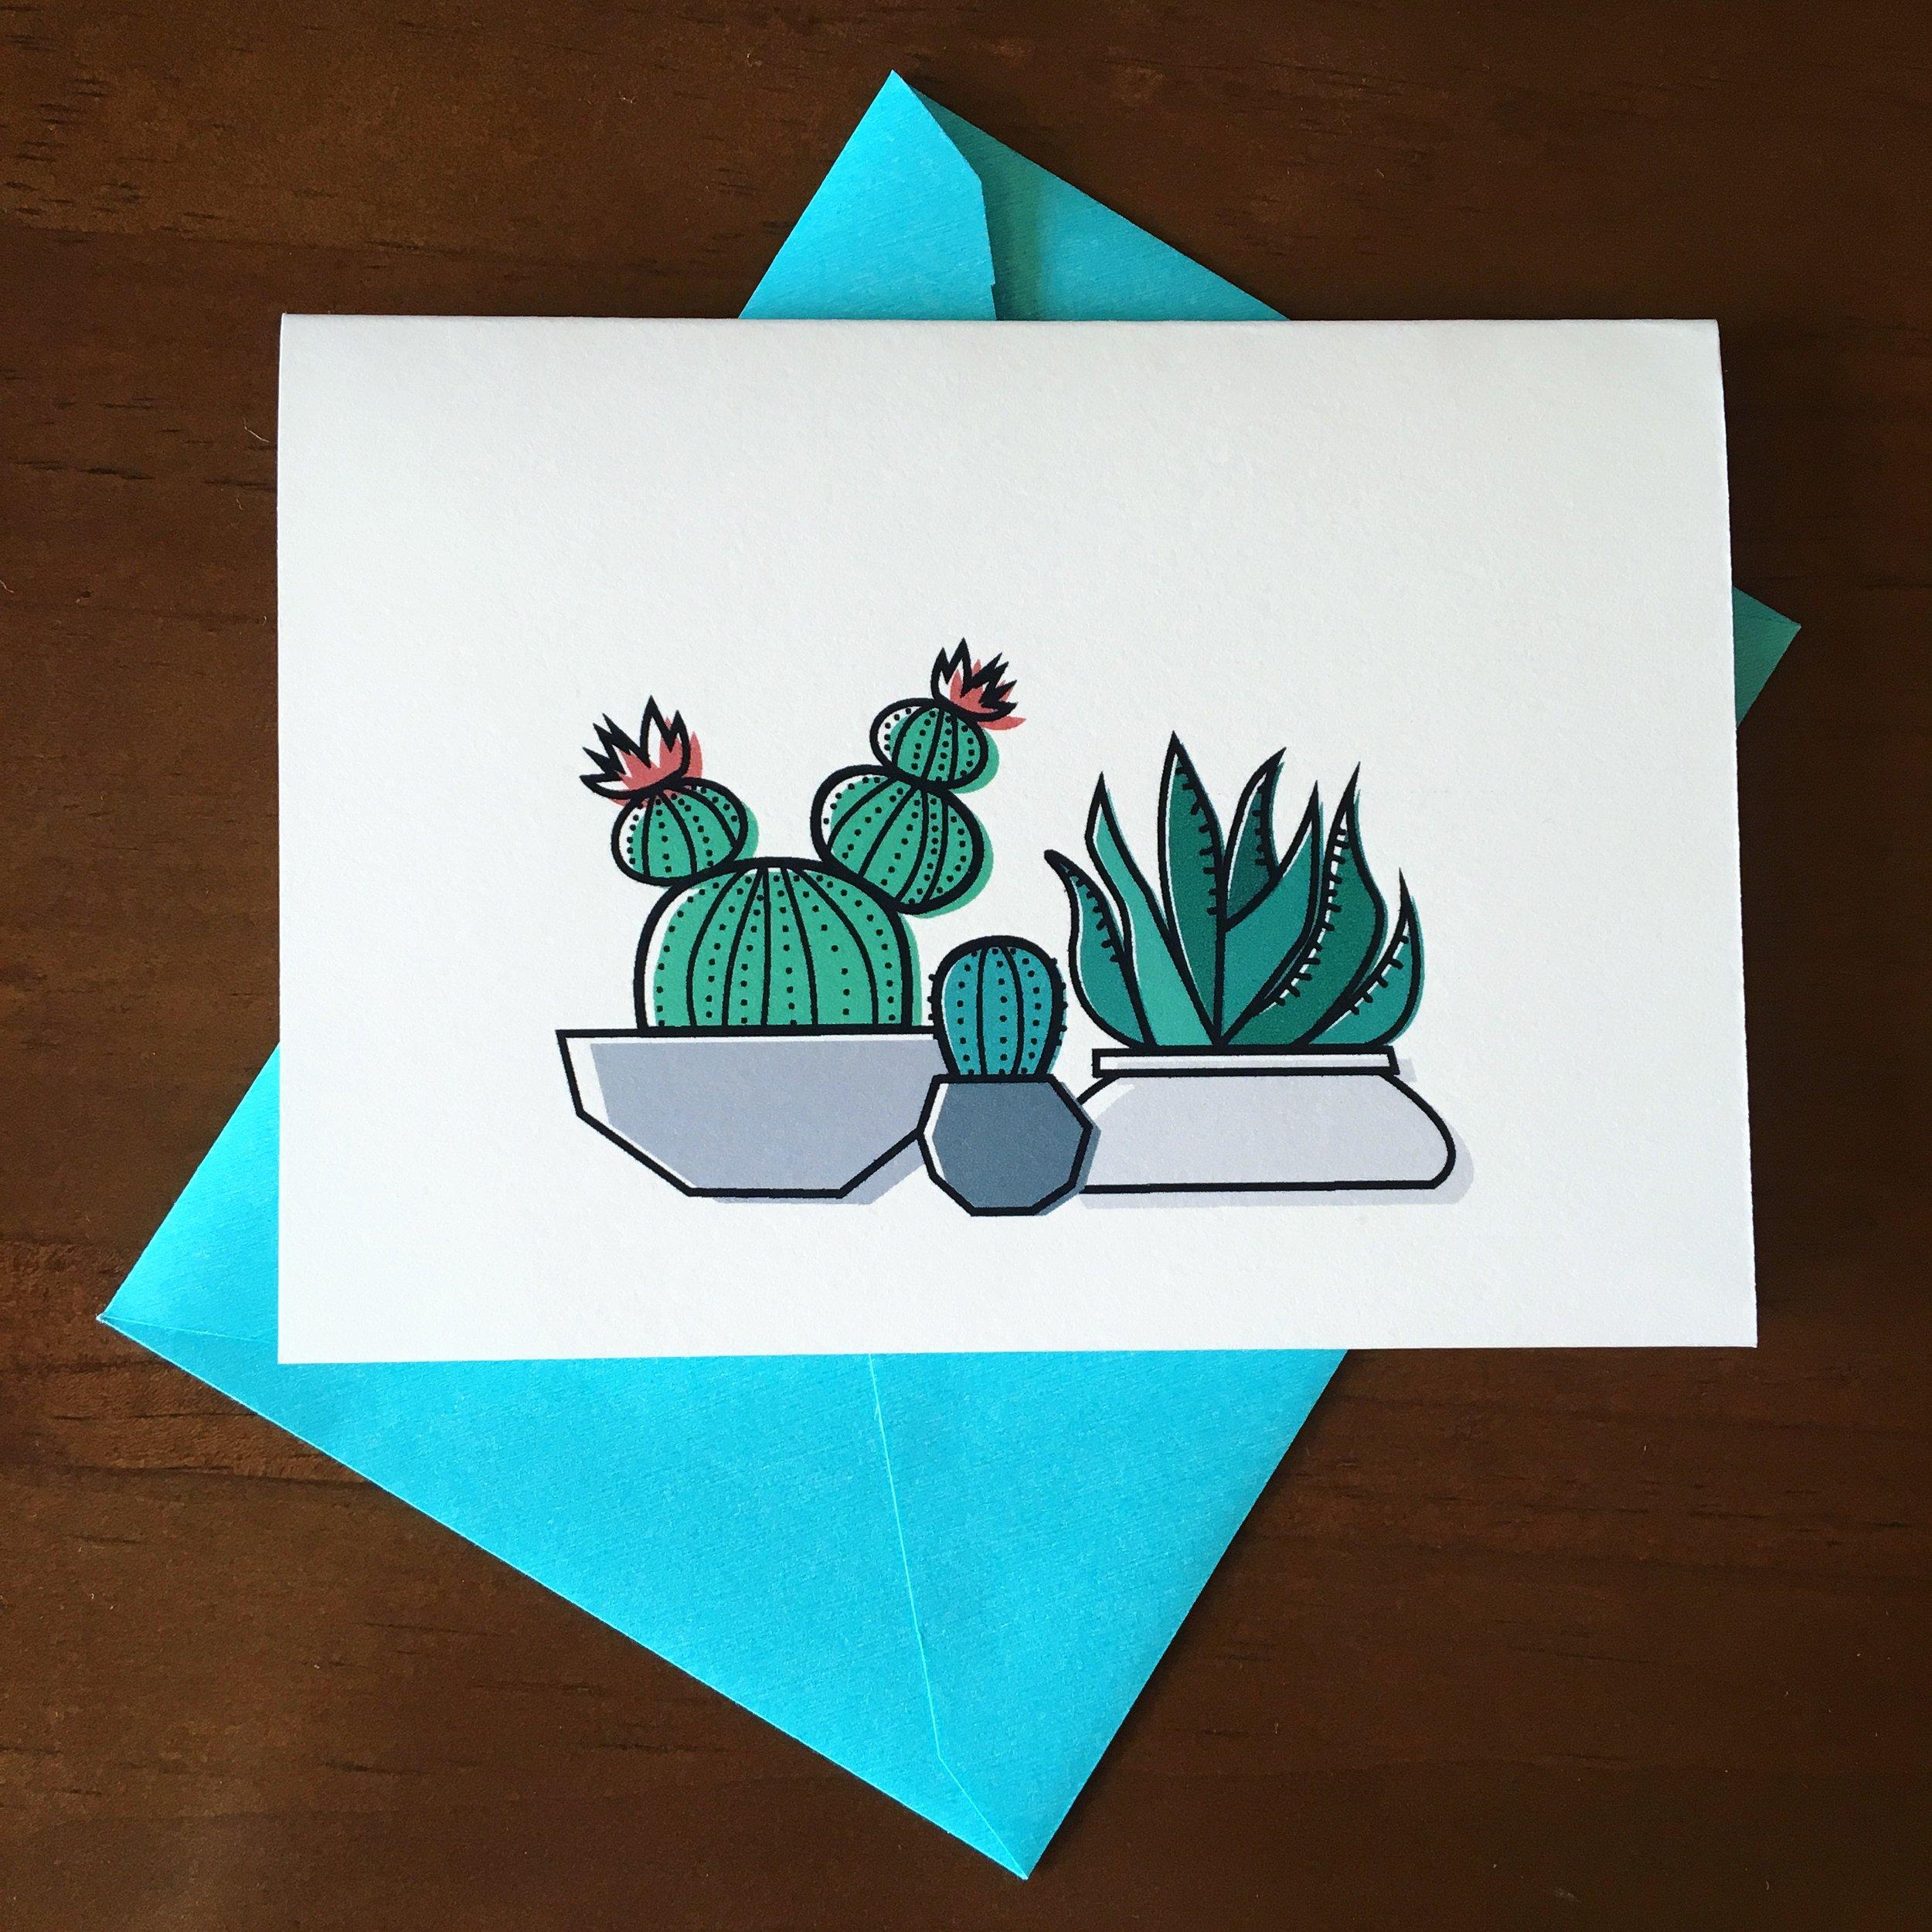 cactus3_card.JPG